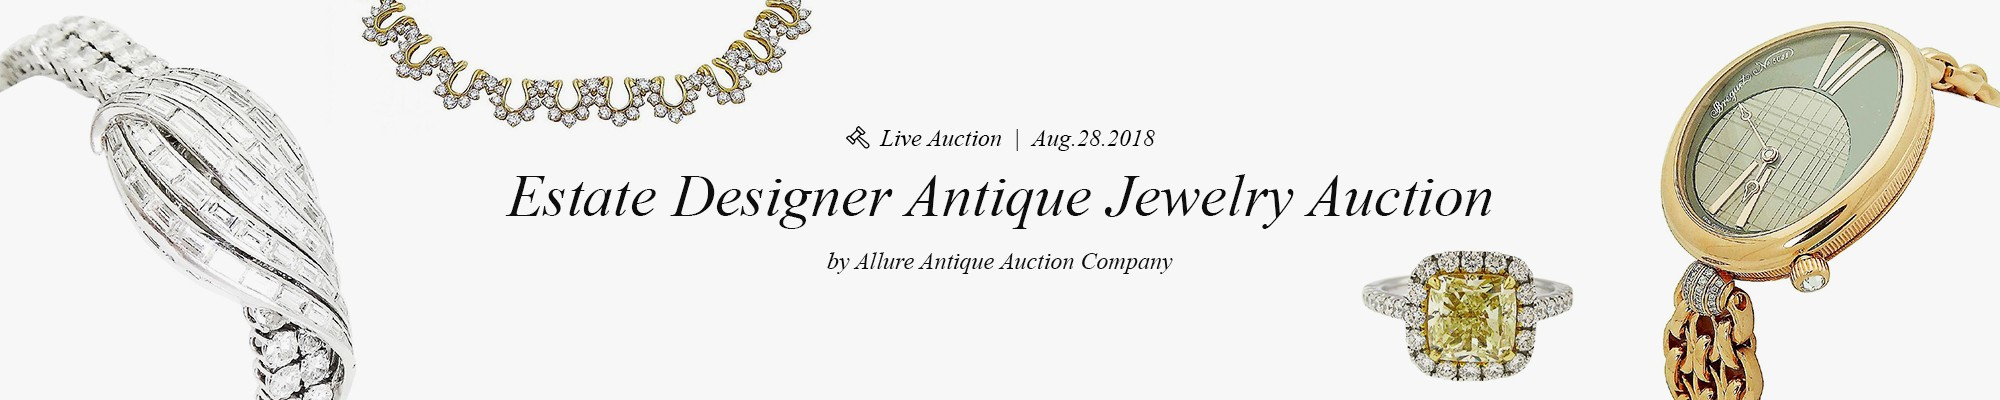 Estate Designer Antique Jewelry Auction - Allure Antique Auction Company